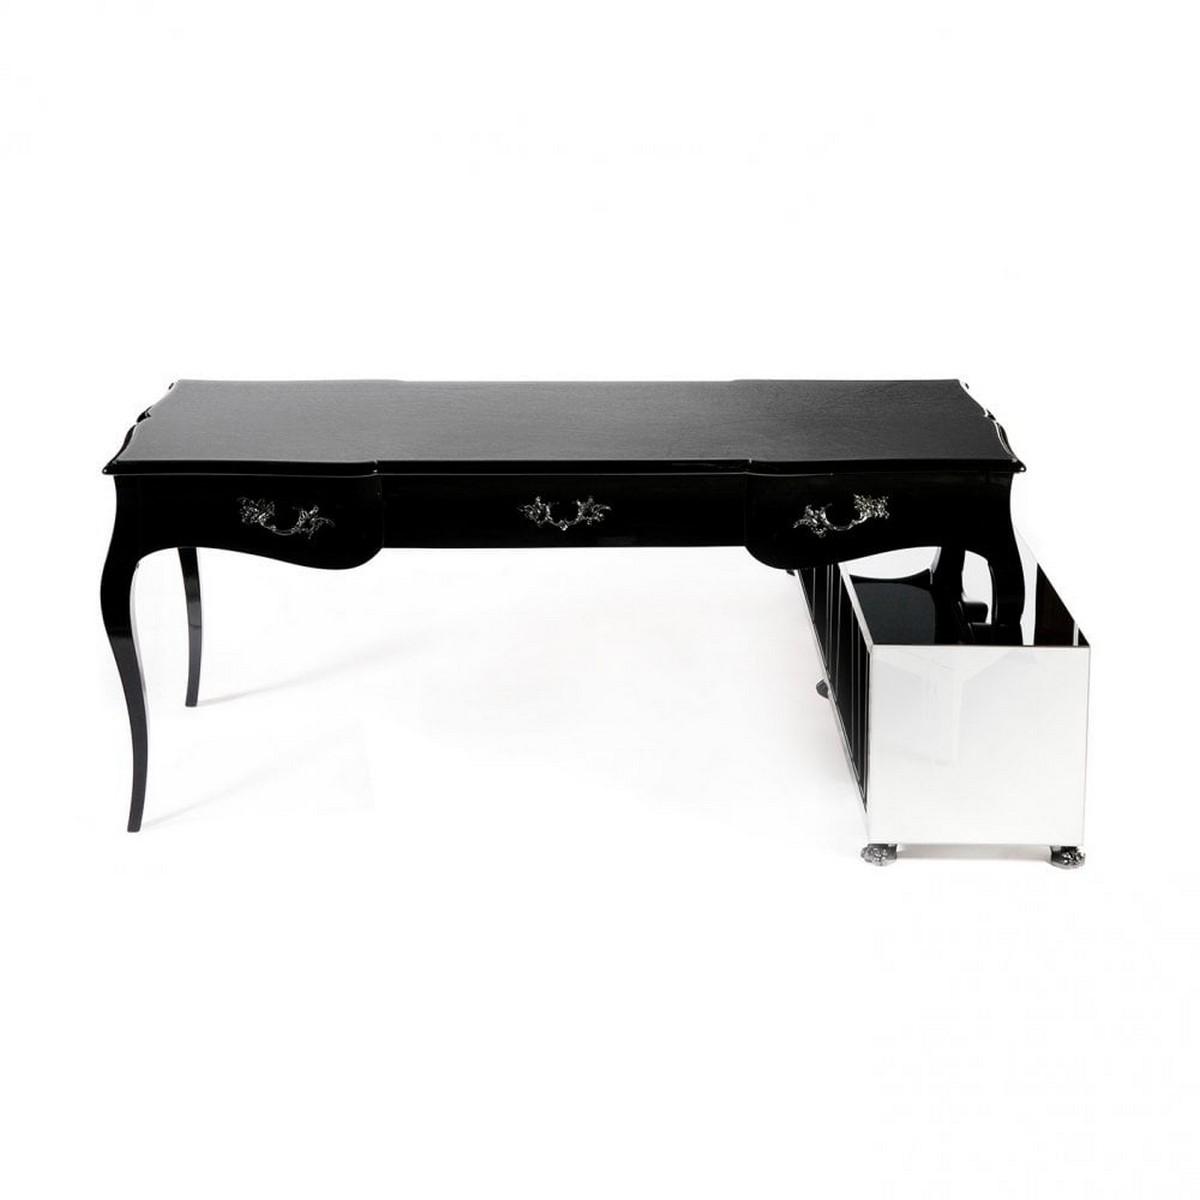 Top Bespoke Luxury Desks luxury desks Top Bespoke Luxury Desks boulevard